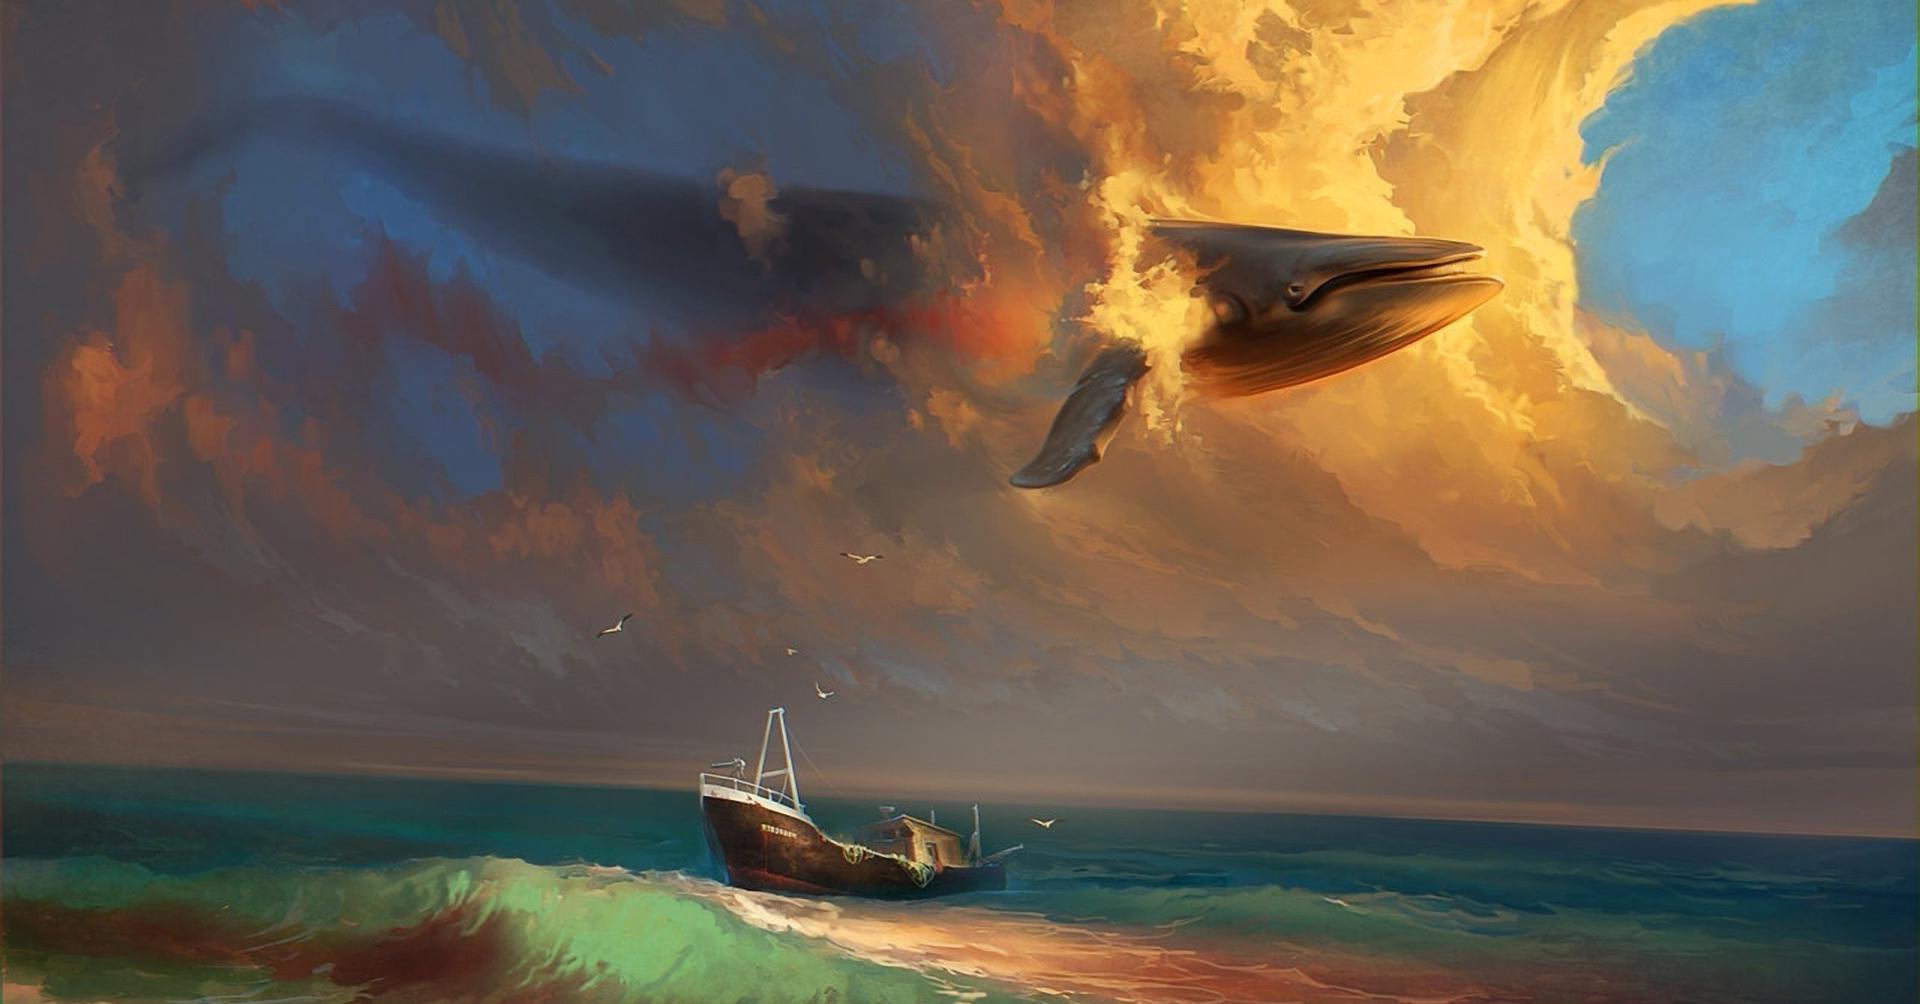 Wallpaper Pemandangan Lukisan Laut Air Langit Tenang